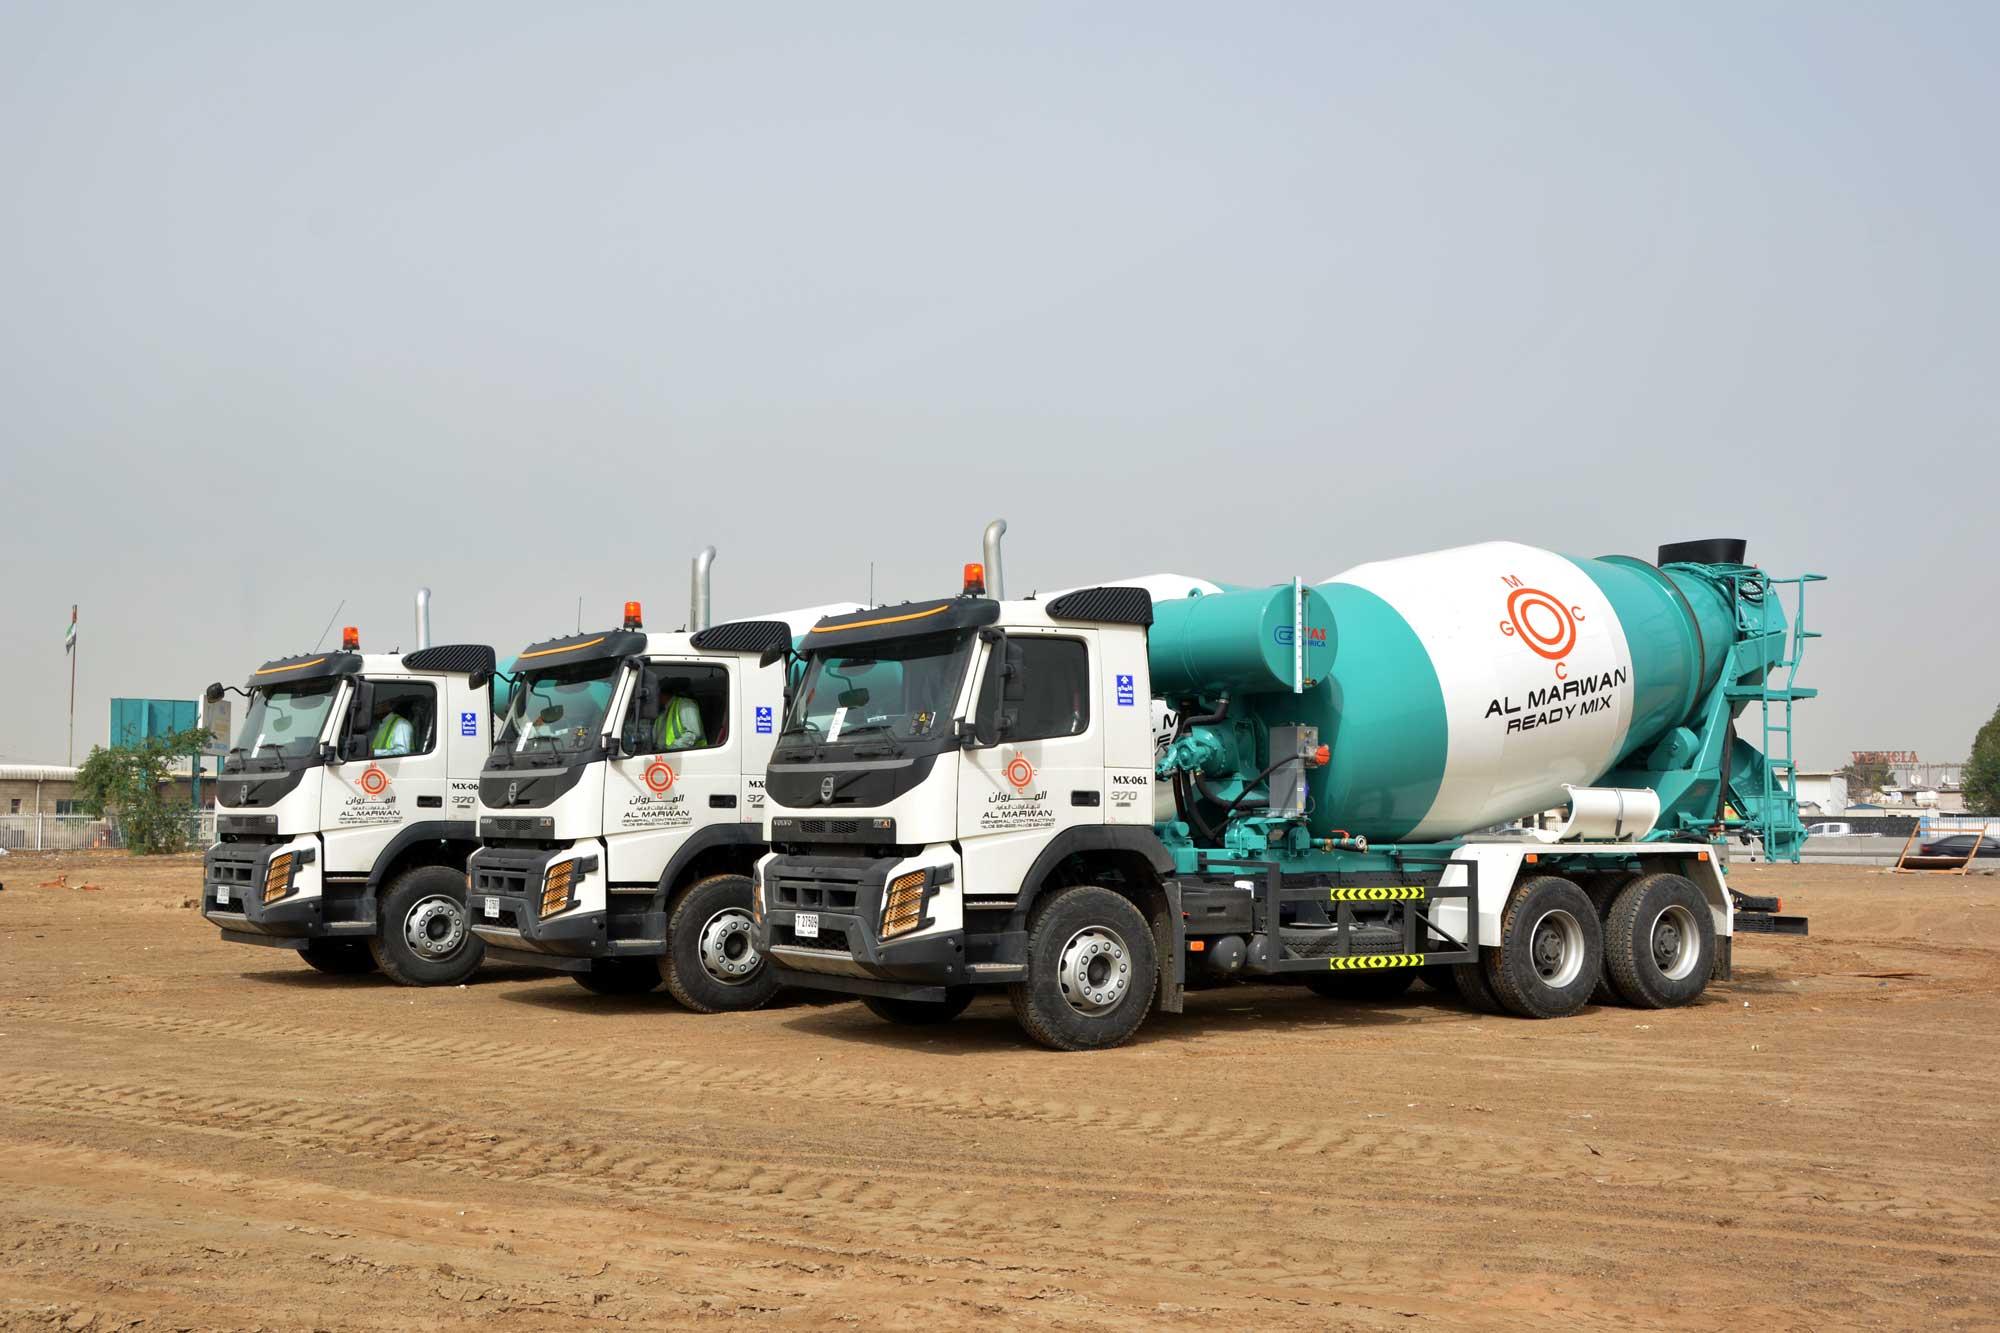 New Arrival - Brand New Volvo Concrete Mixer Trucks FMX 370